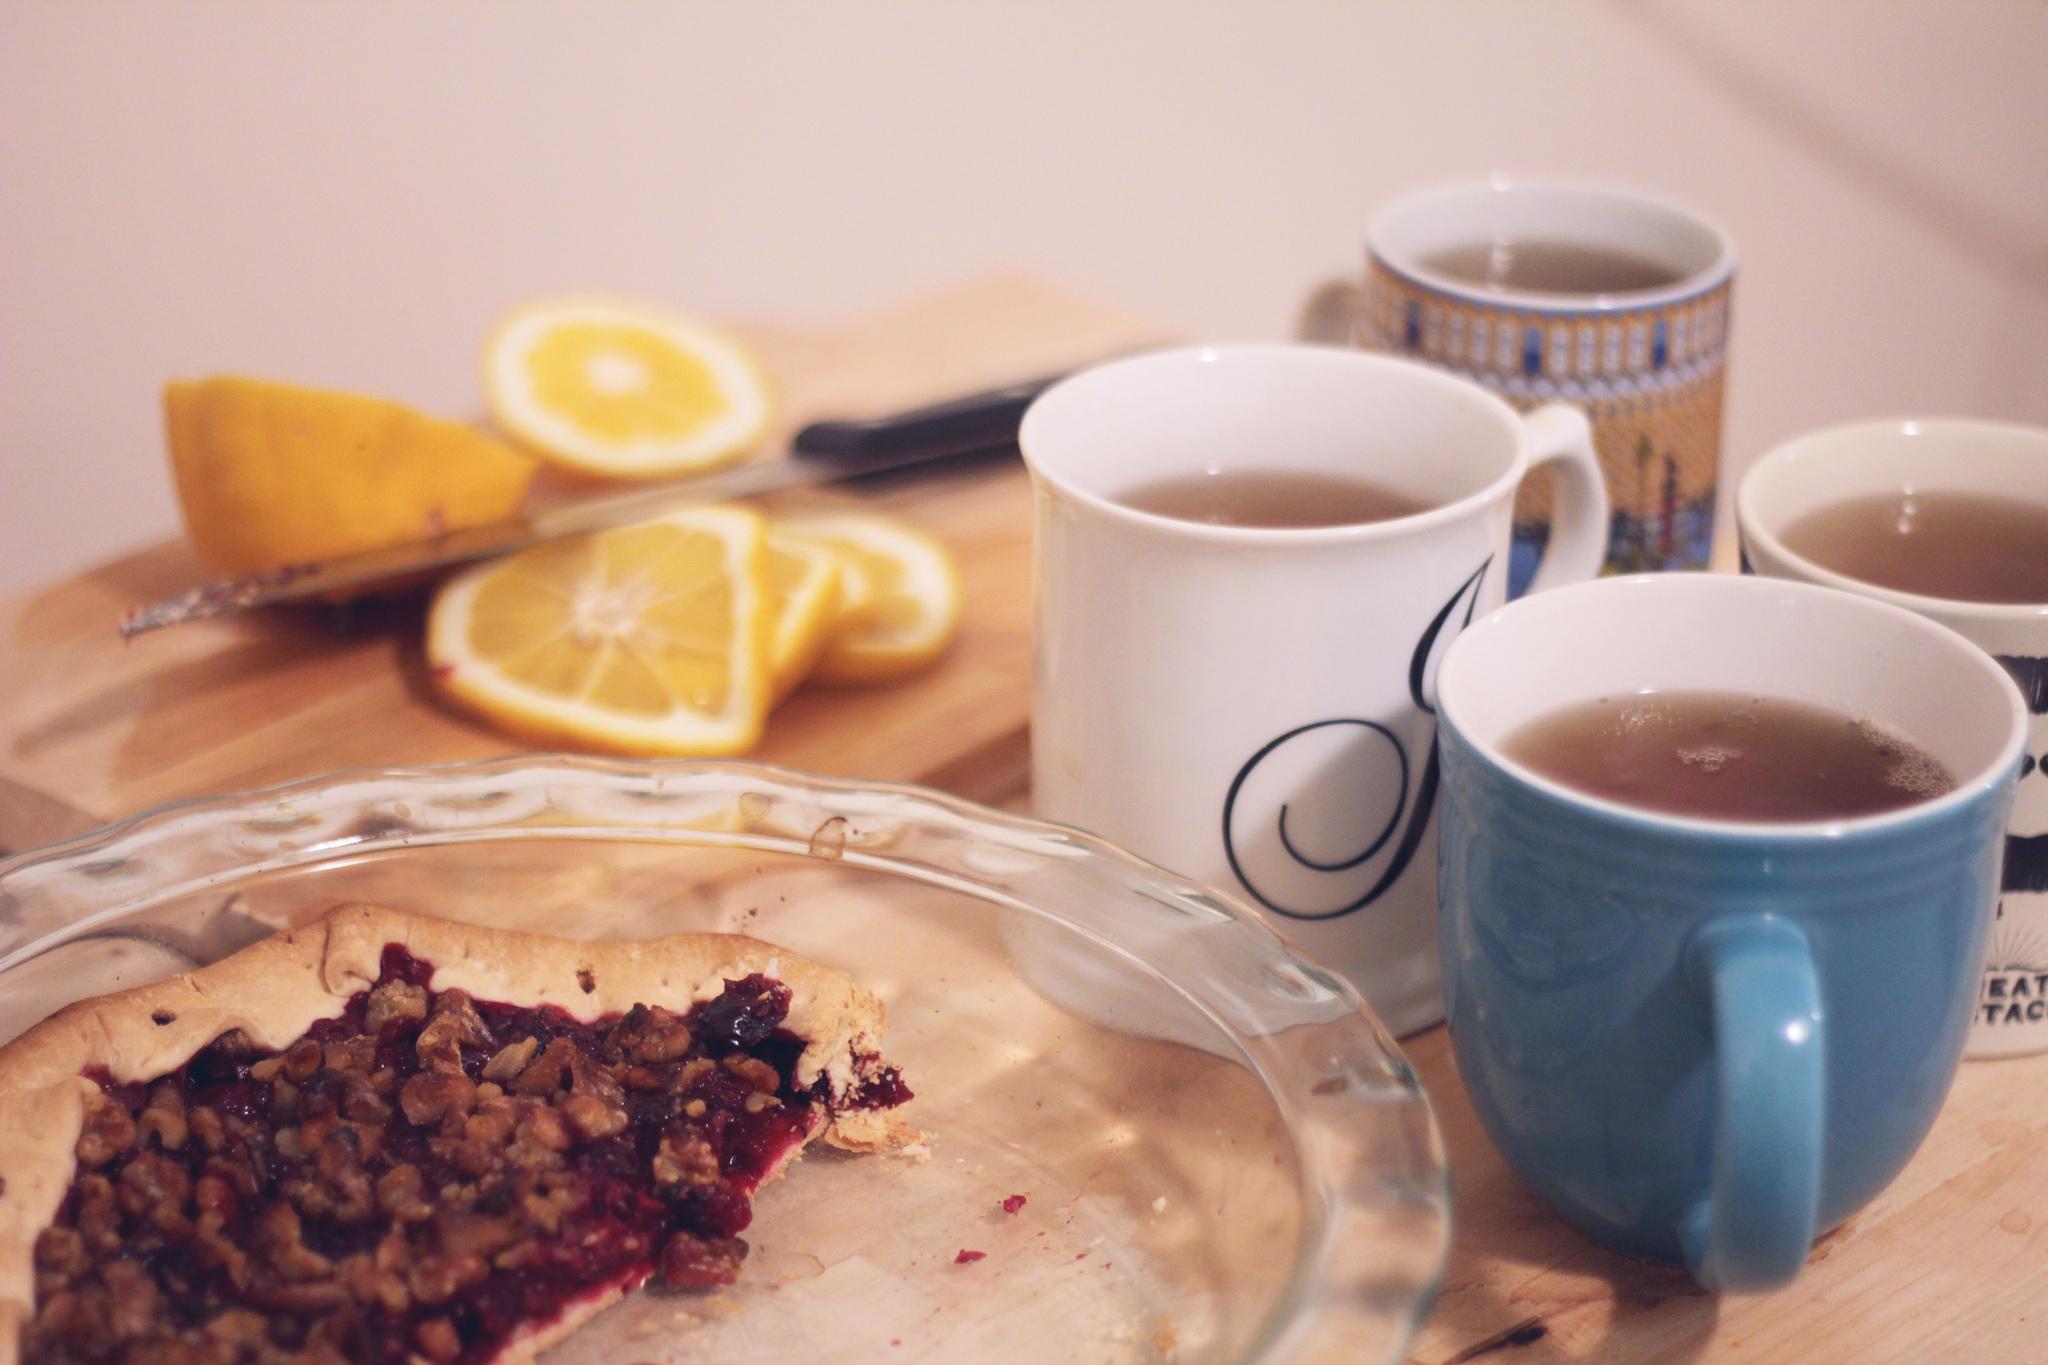 Tea and pies | © Jane Rahman/Flickr